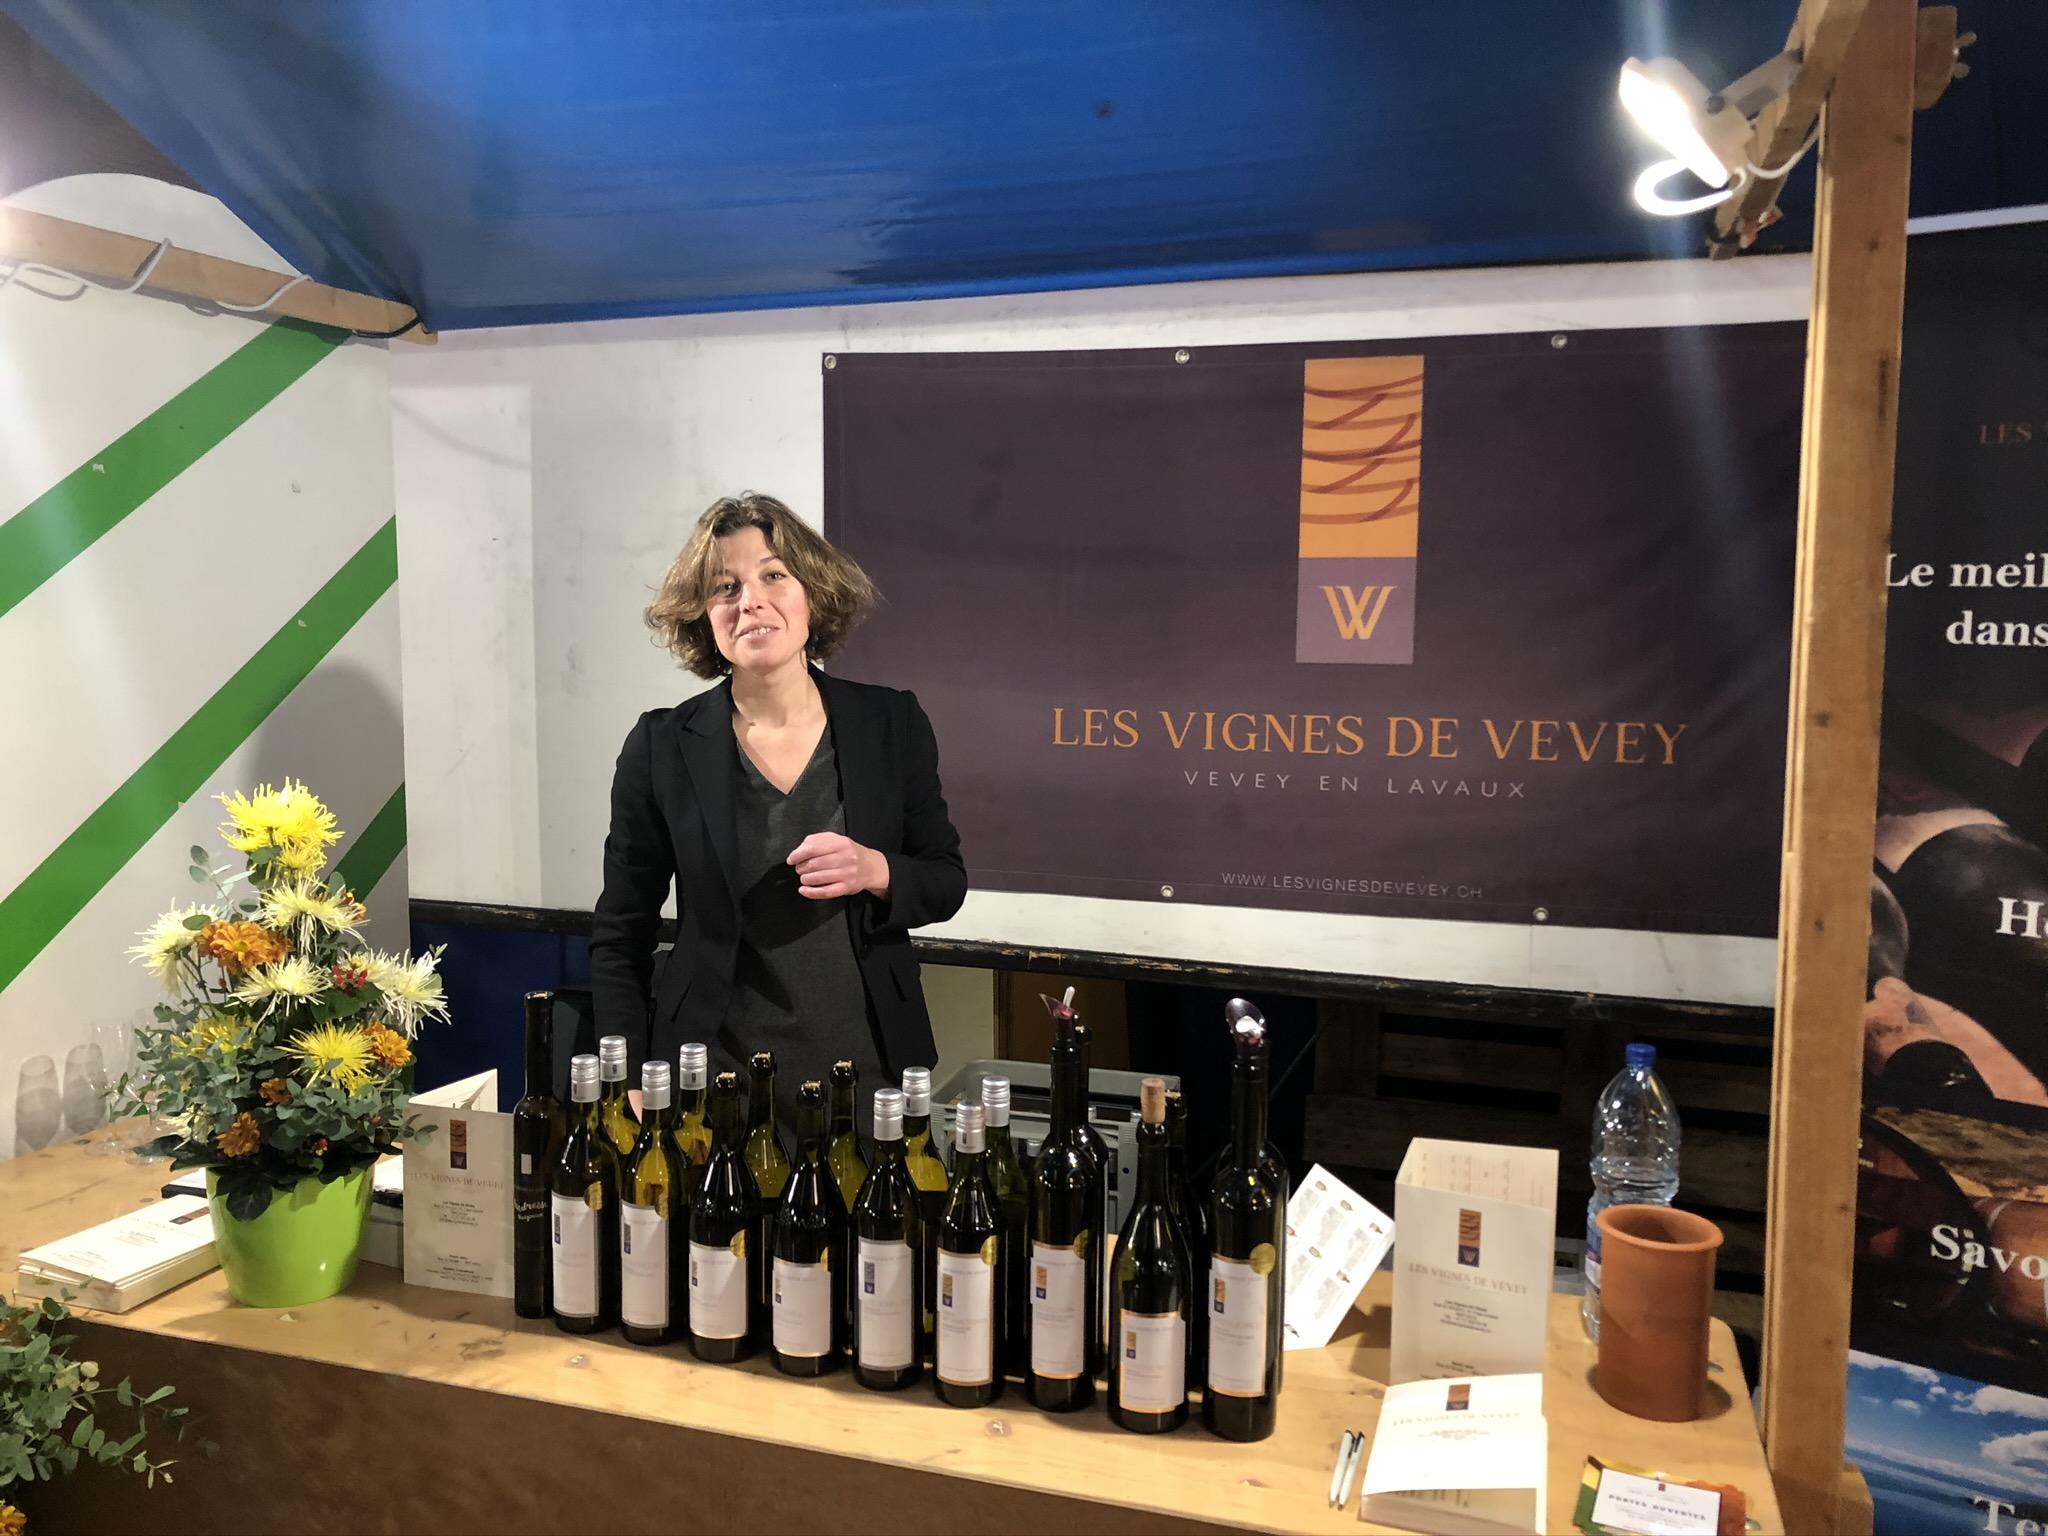 Les Vignes de Vevey